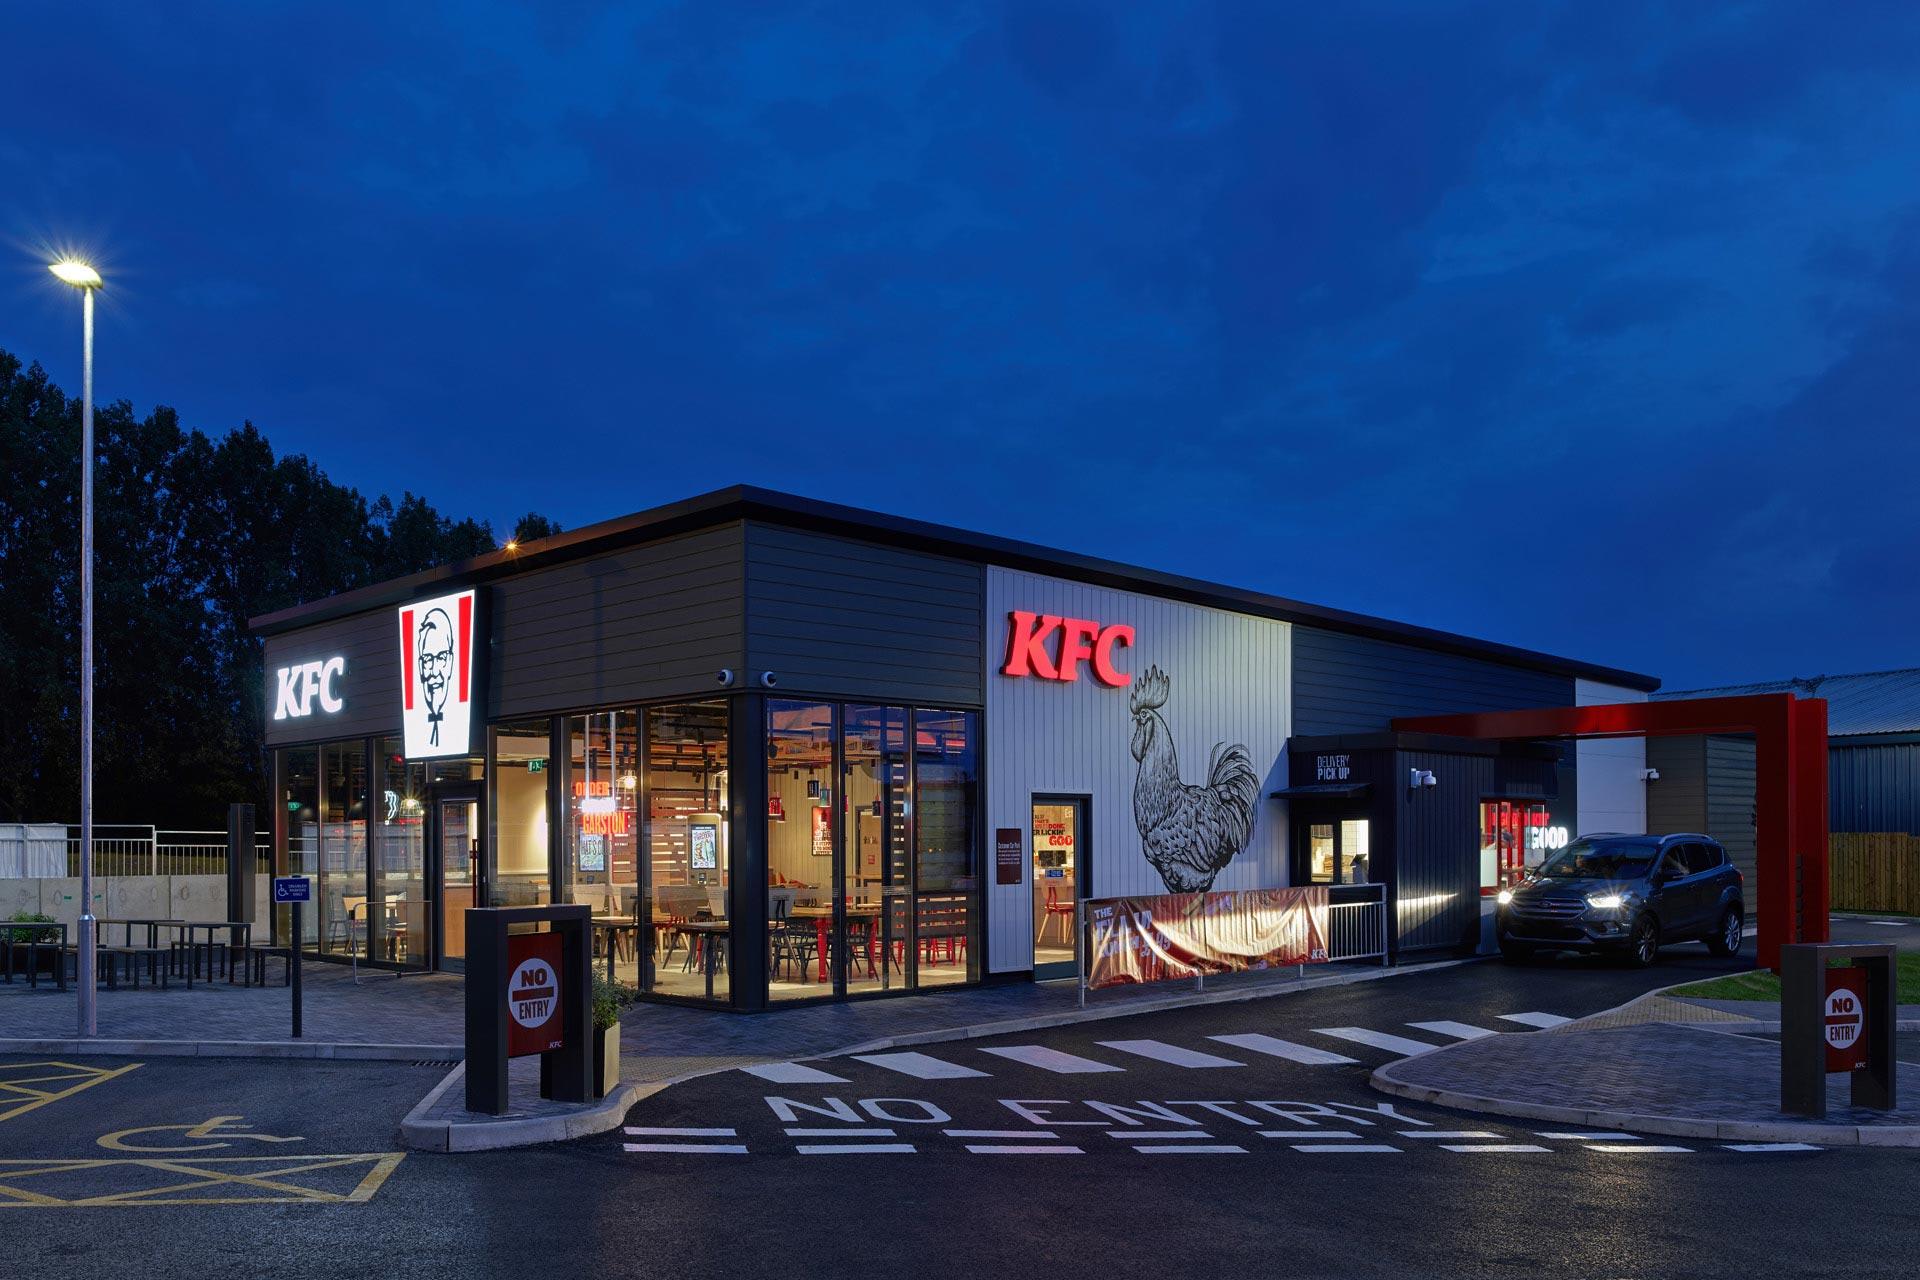 KFC Garston, Liverpool - Modular Restaurant building - External night view